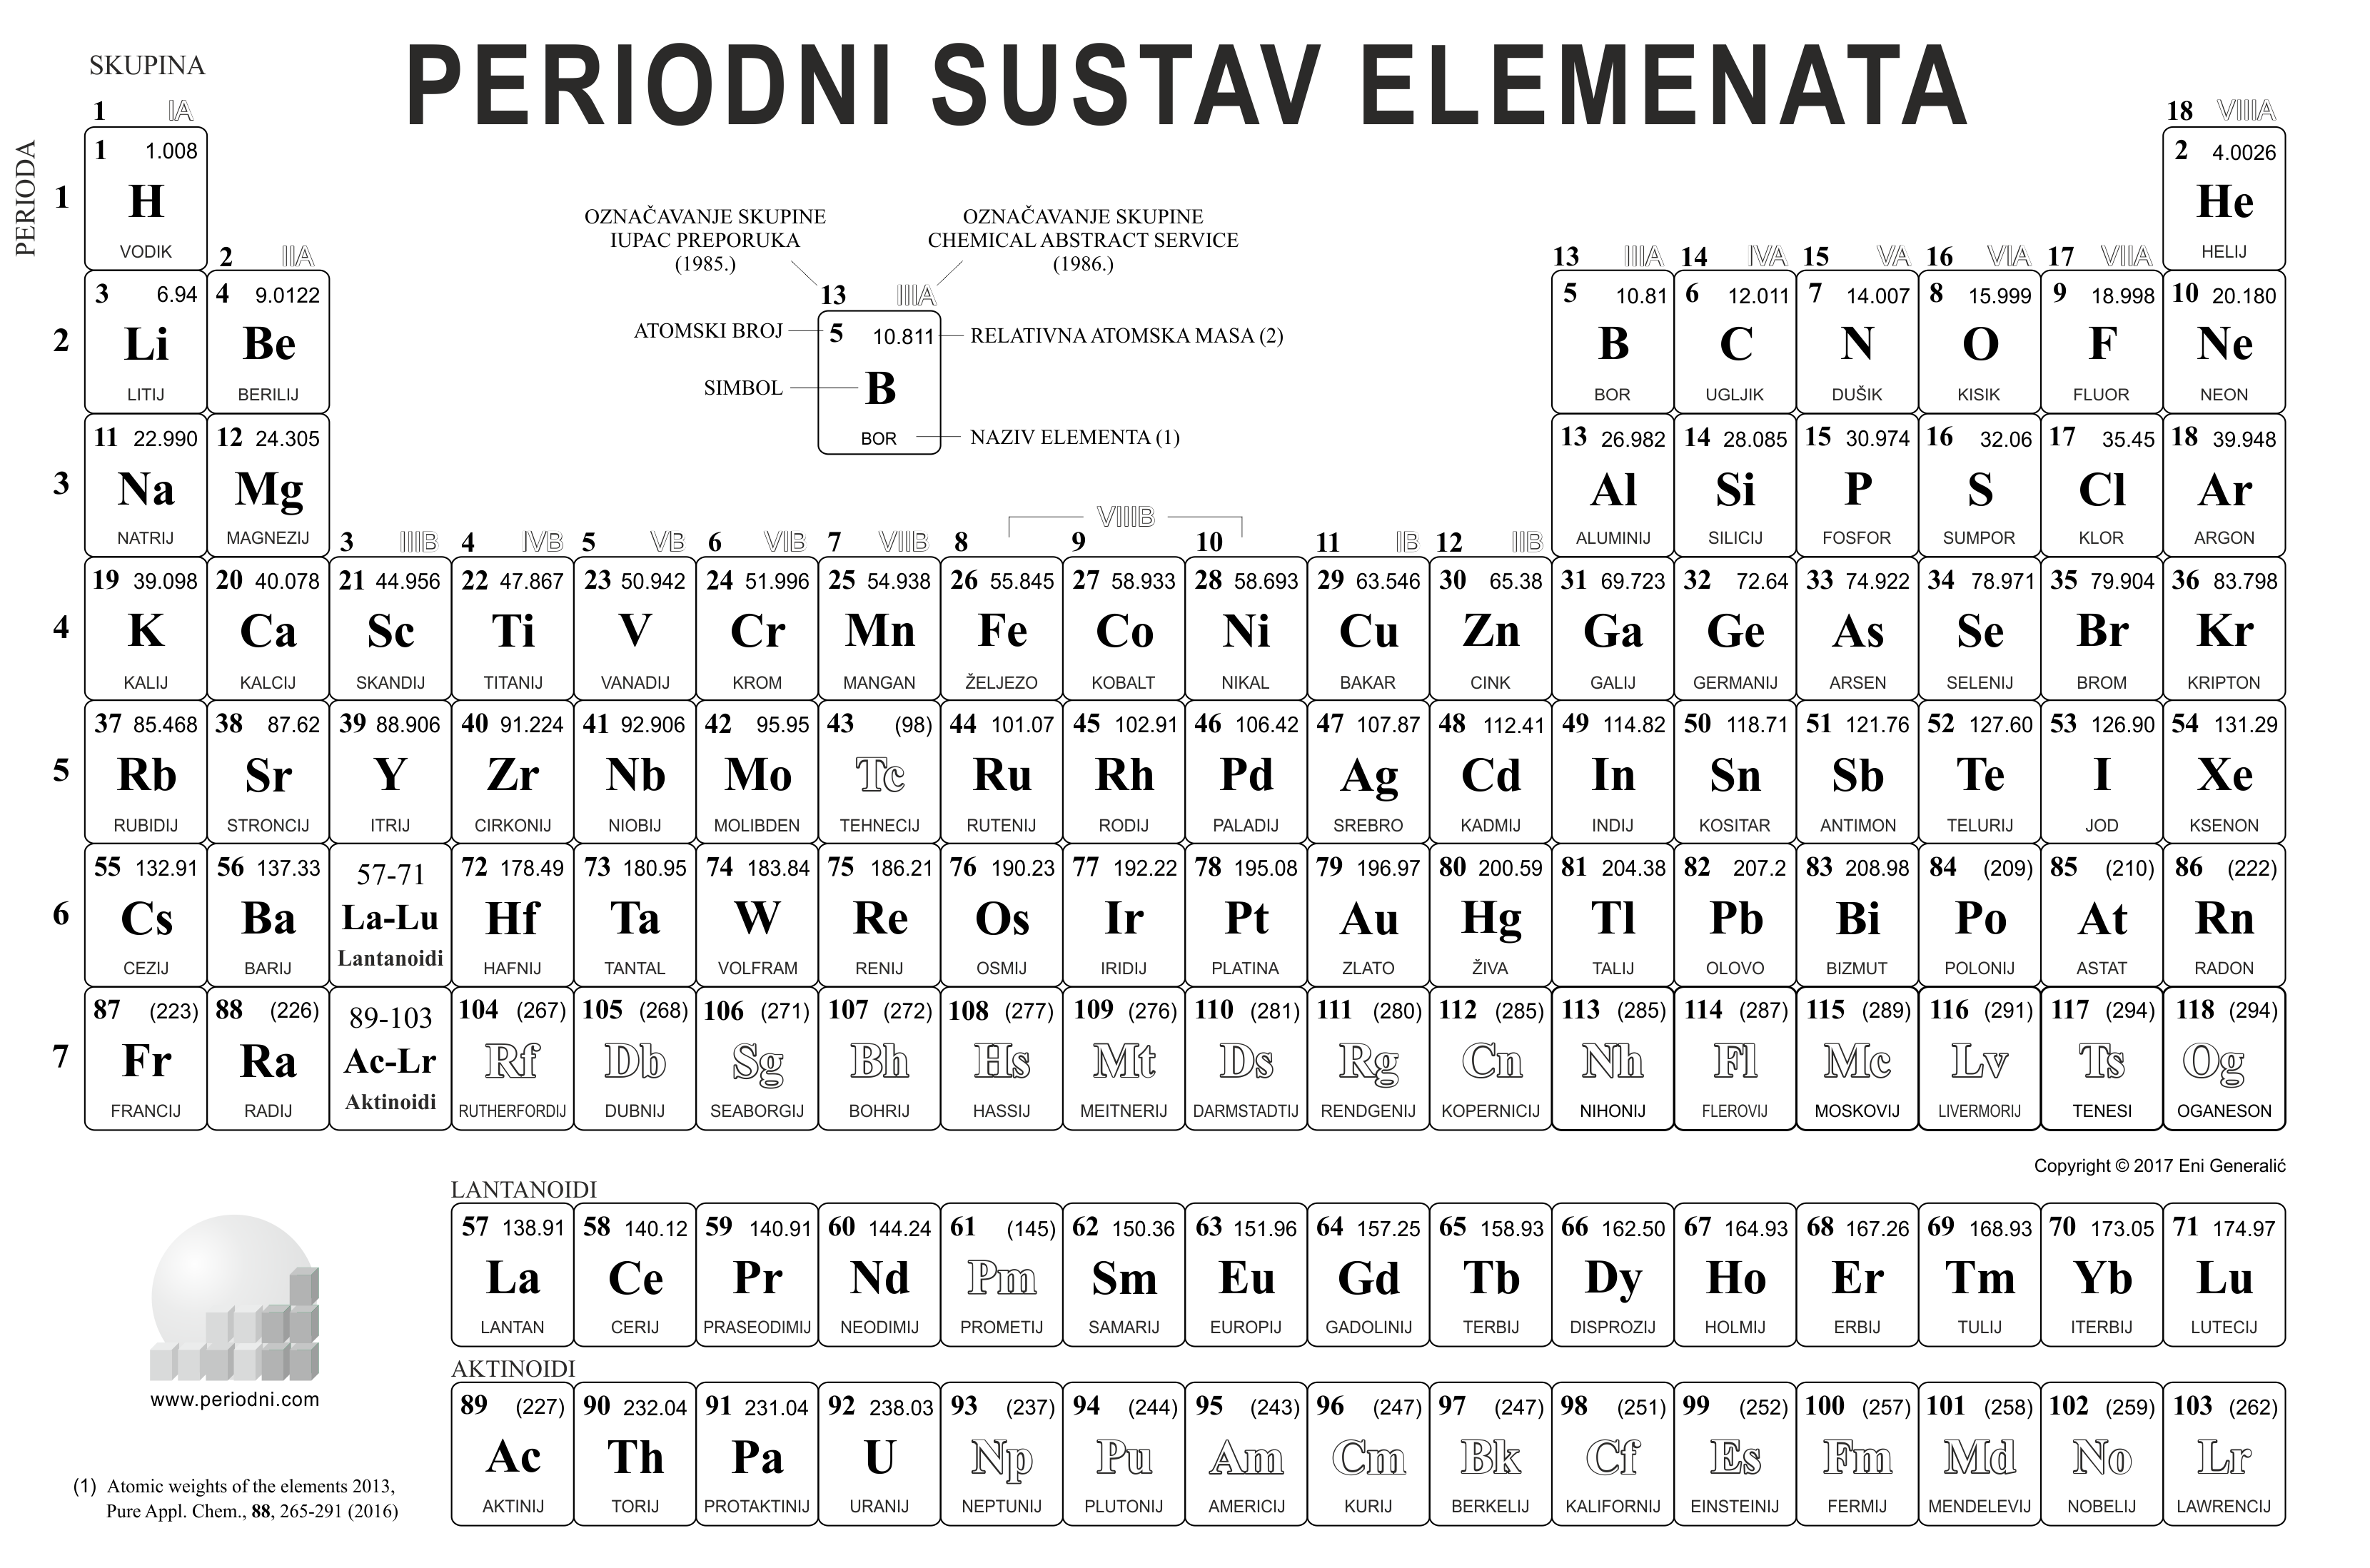 Direct download link: https://www.periodni.com/gallery/periodni_sustav-crni.png